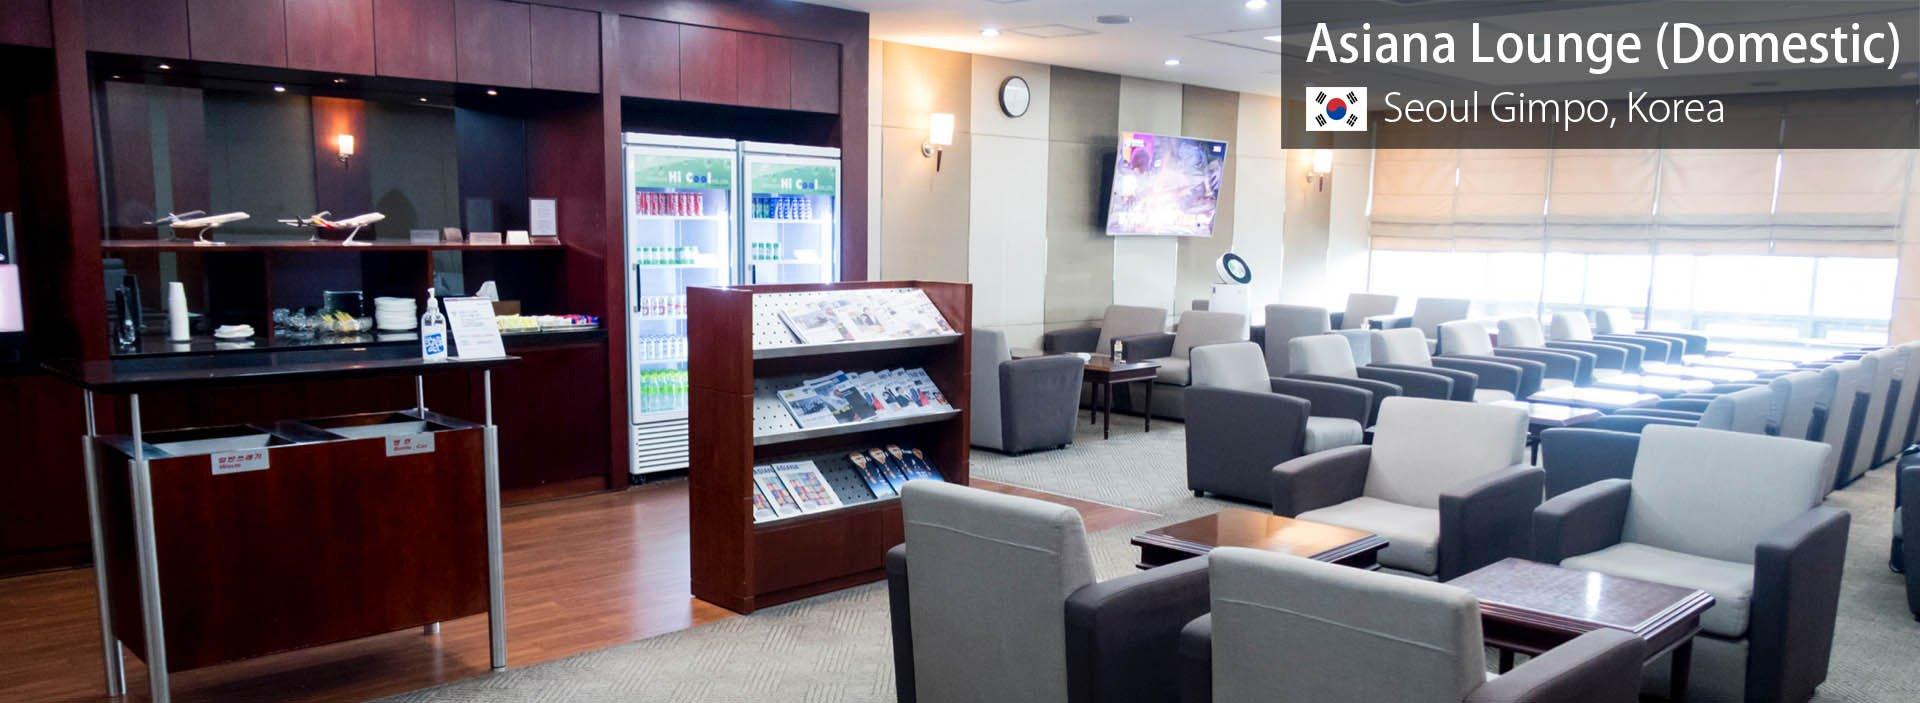 Lounge Review: Asiana Lounge at Seoul Gimpo